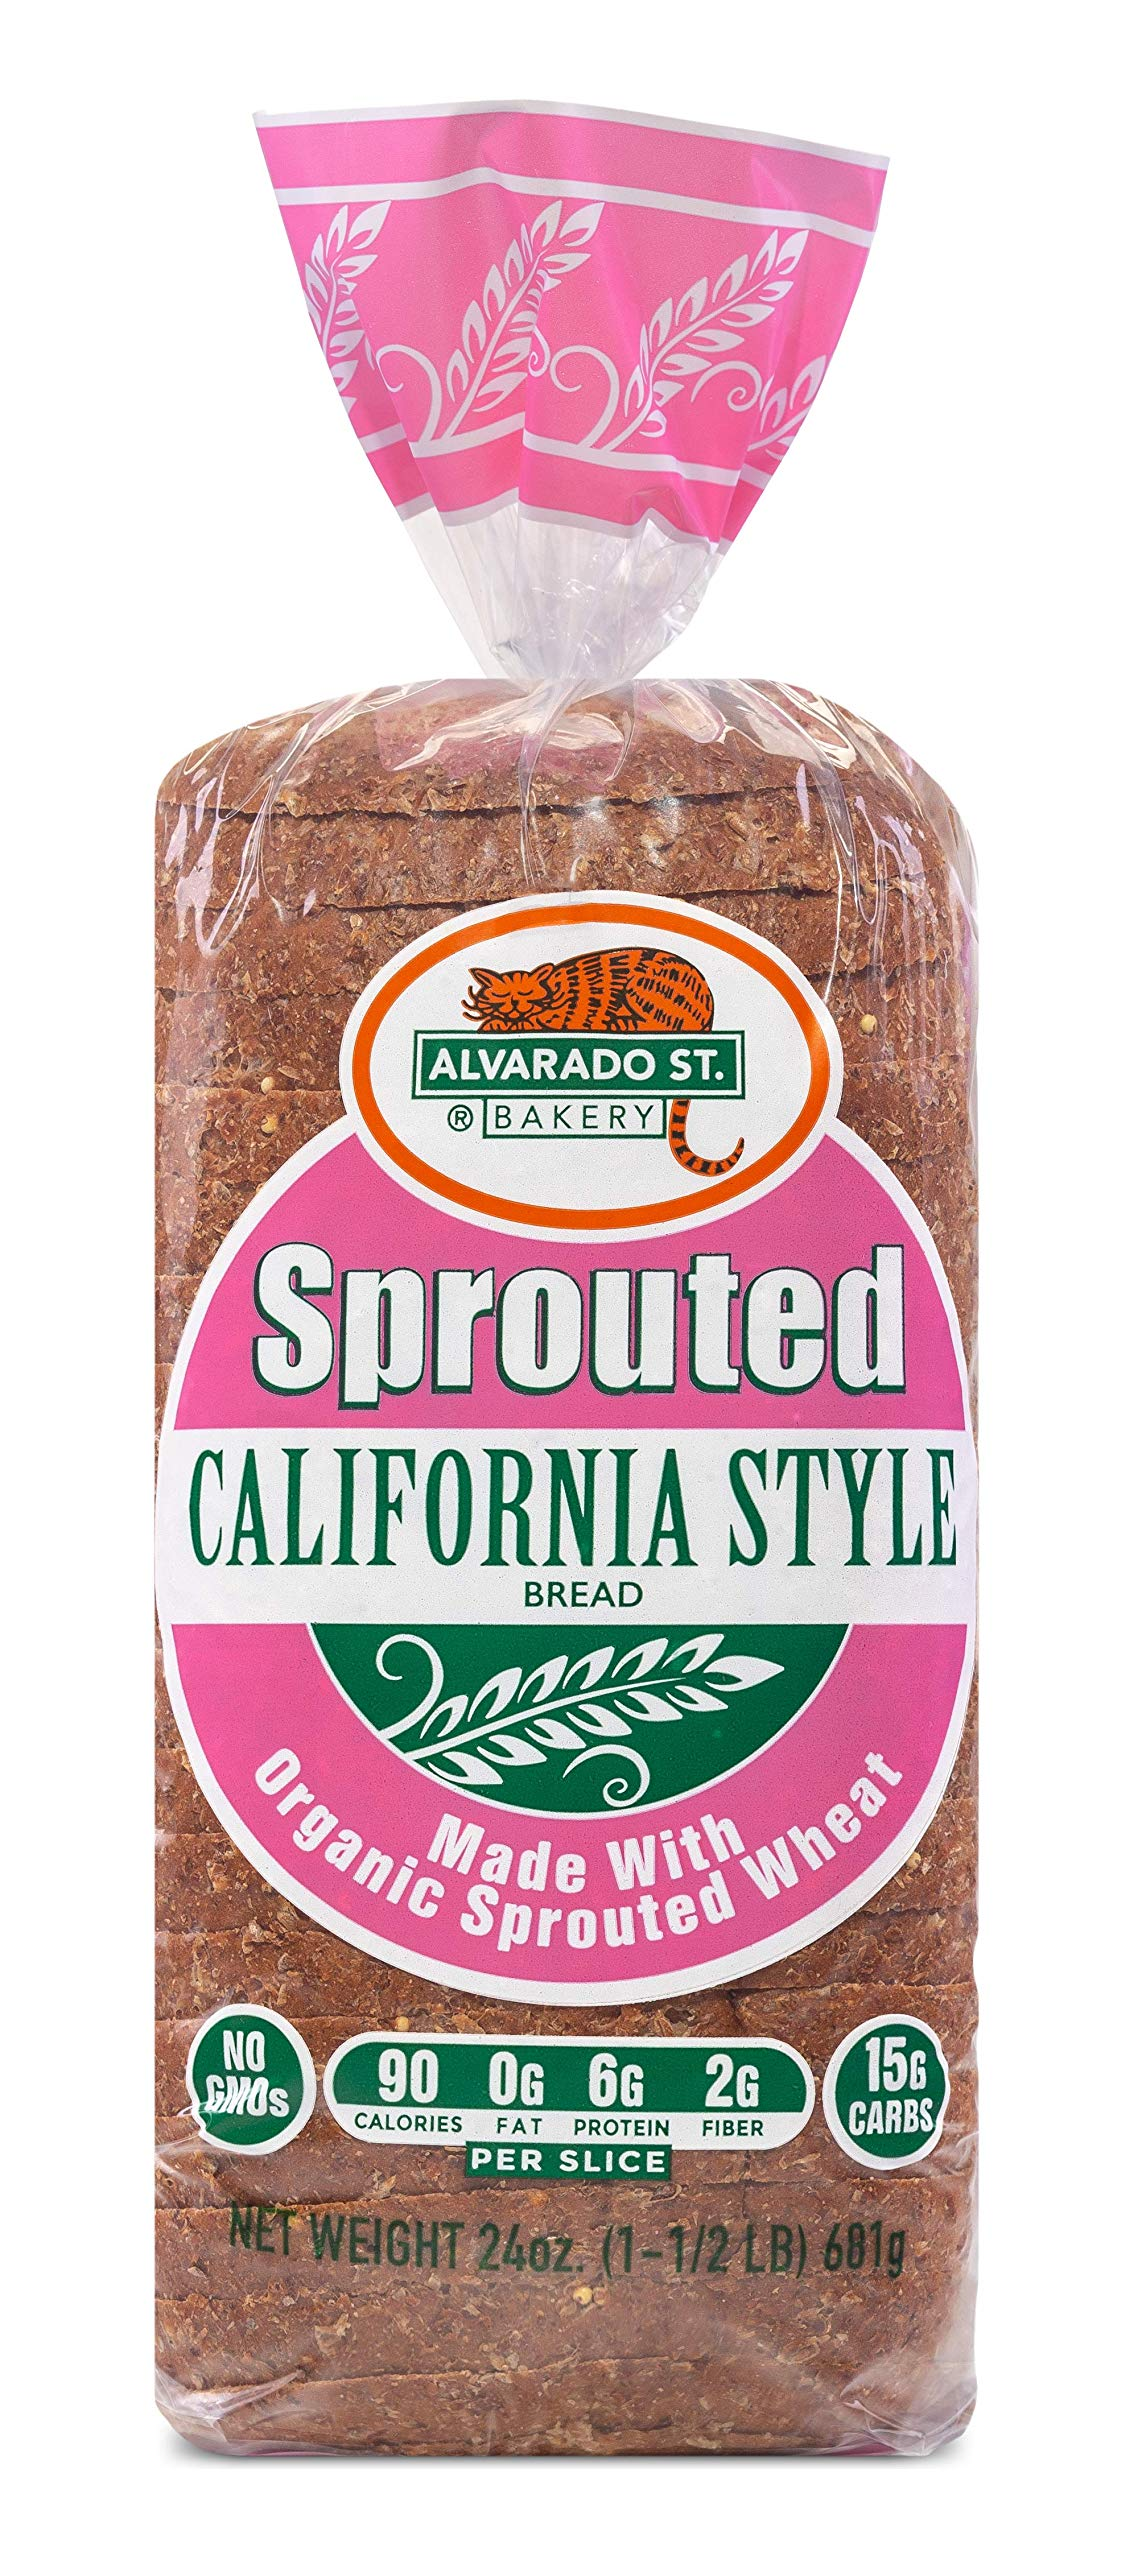 Alvarado Street Bakery Organic California Style Complete Protein Bread, 24 Ounce -- 6 per case.